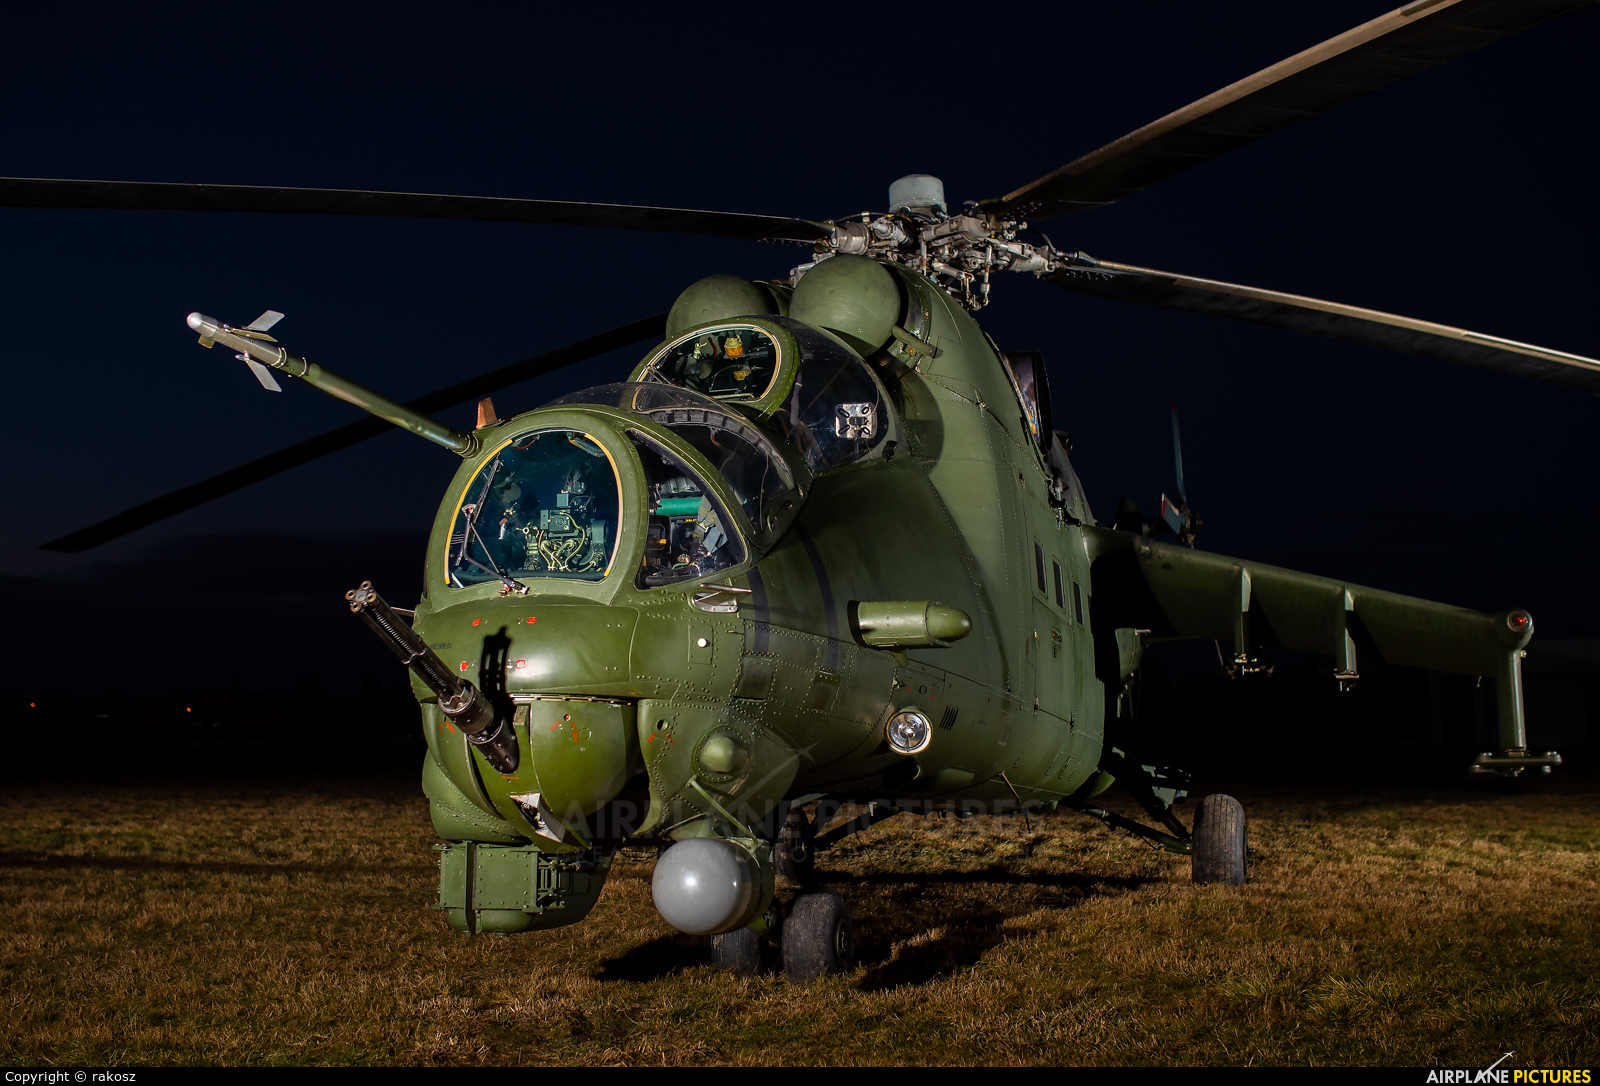 Poland - Army 731 aircraft at Gliwice